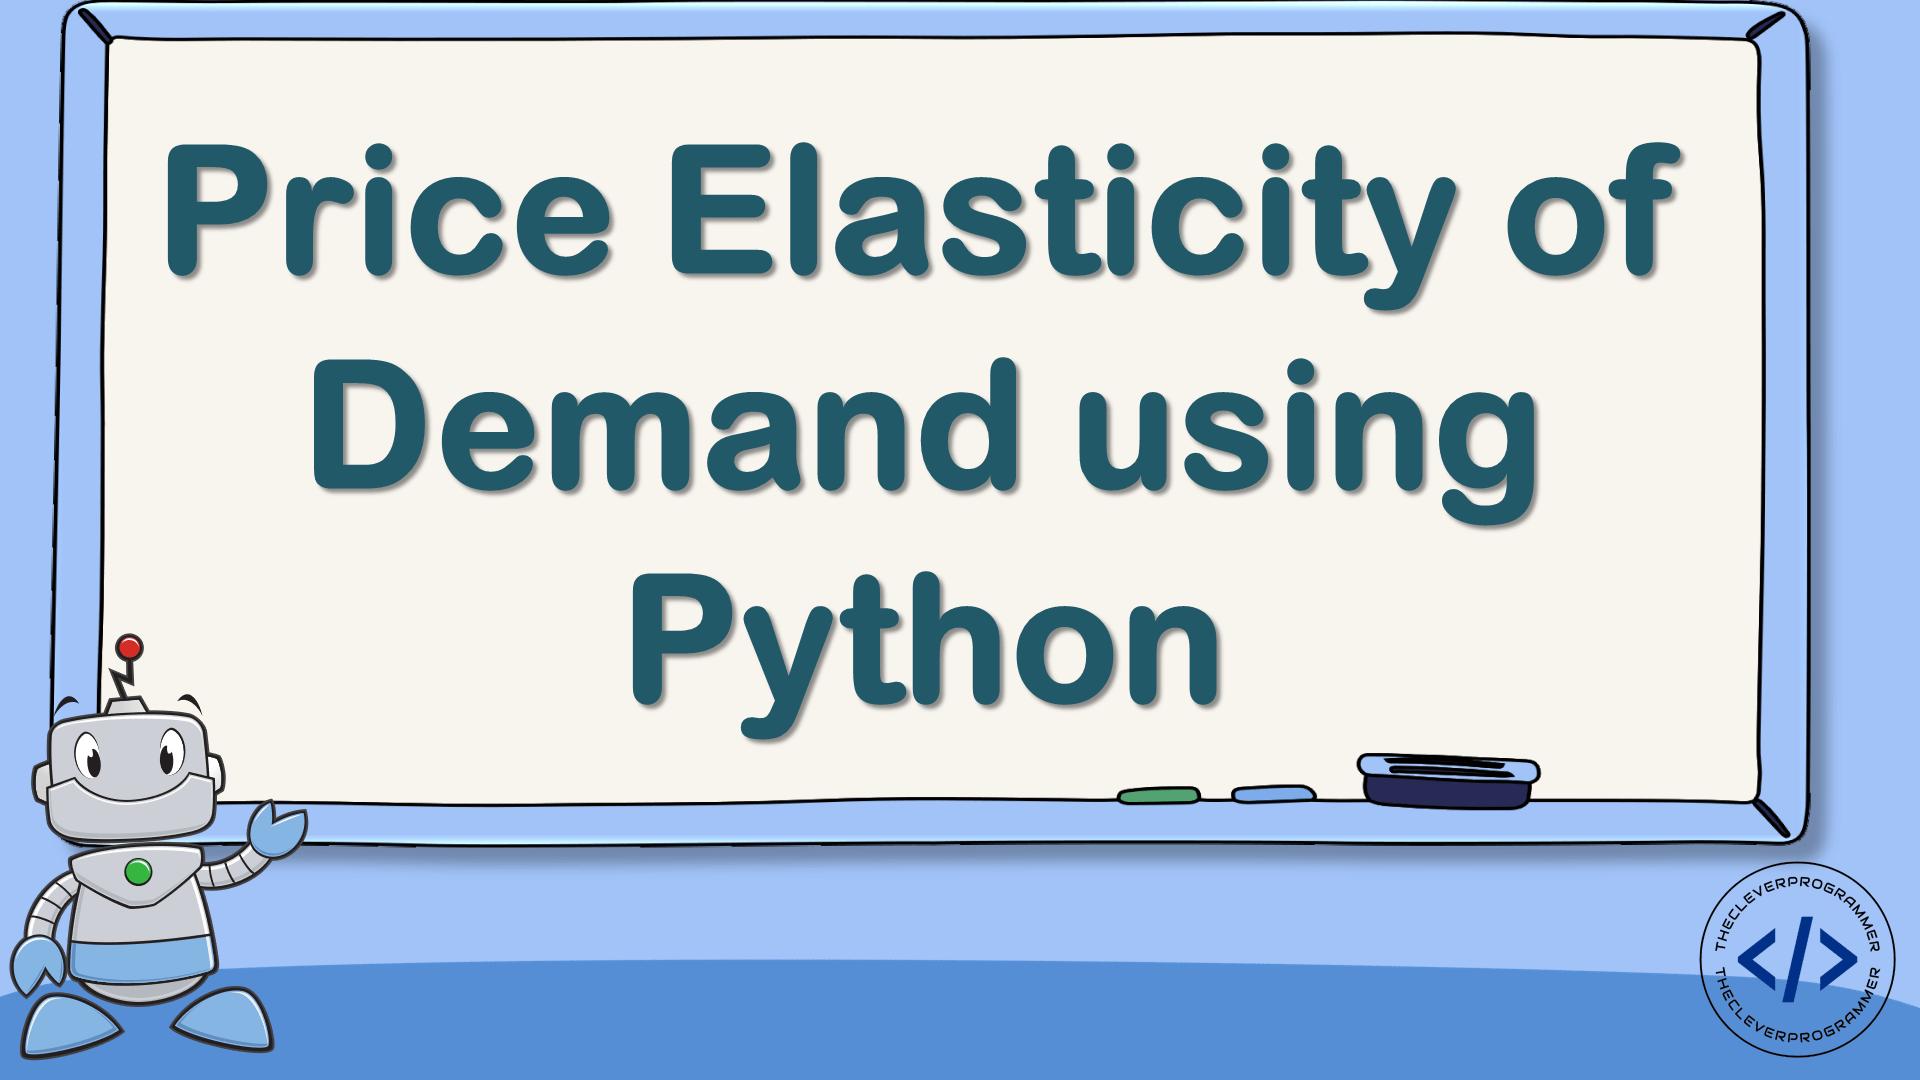 Price Elasticity of Demand using Python